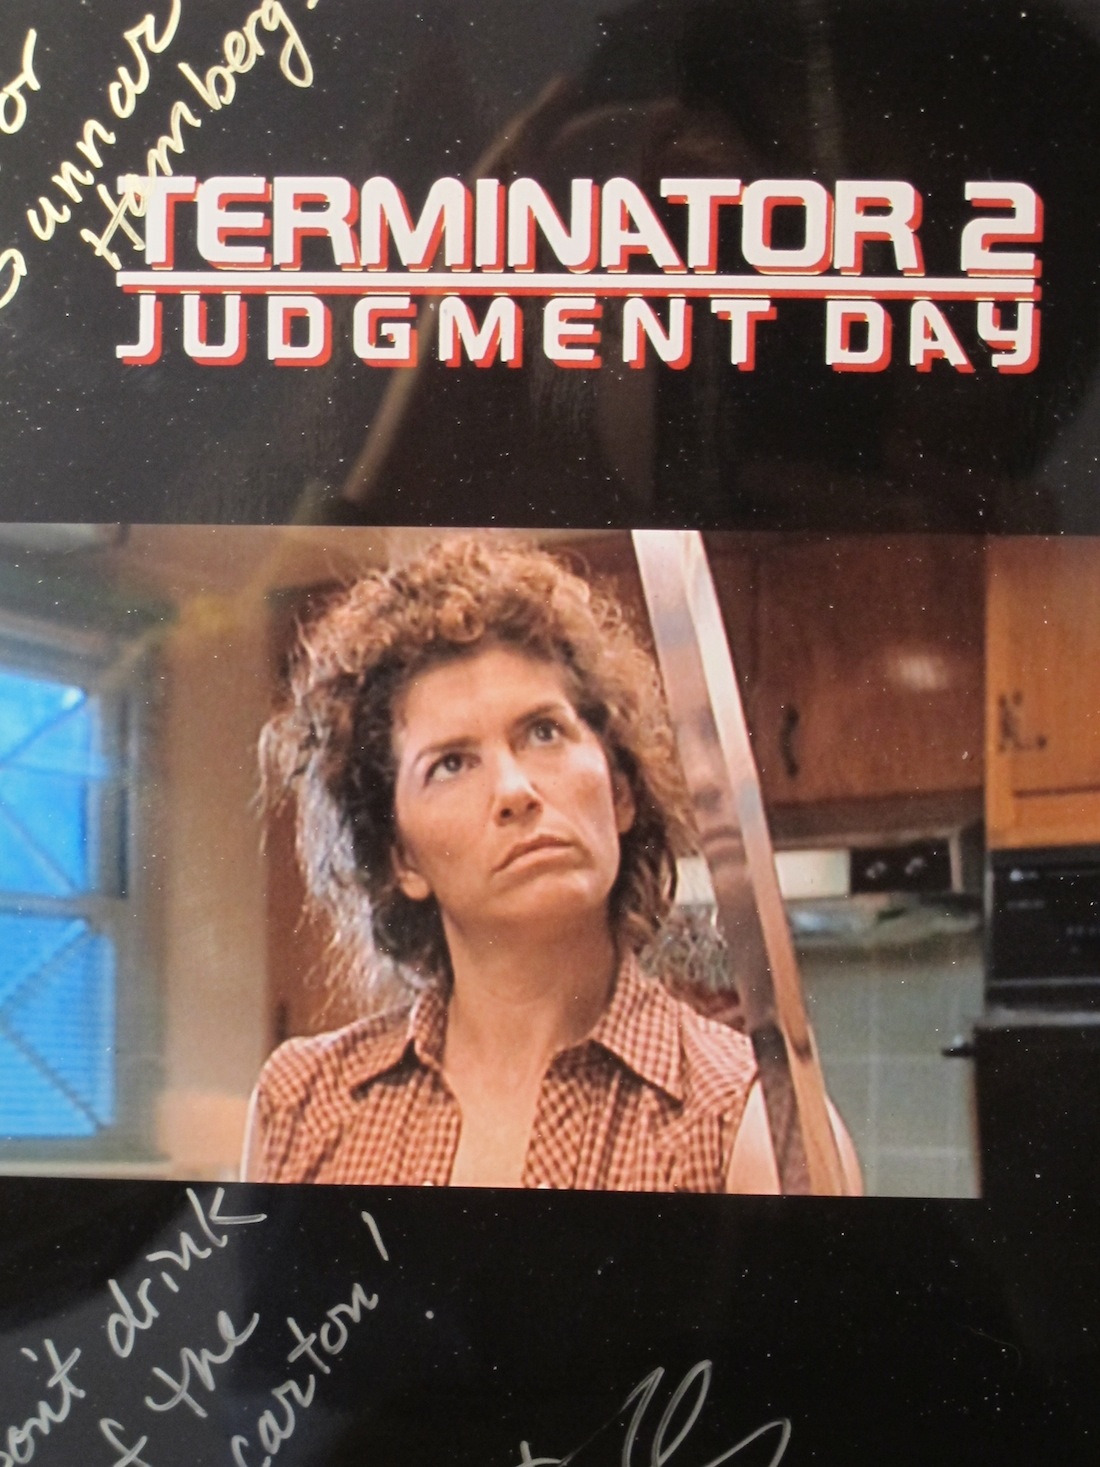 Jenette Goldstein Terminator 2